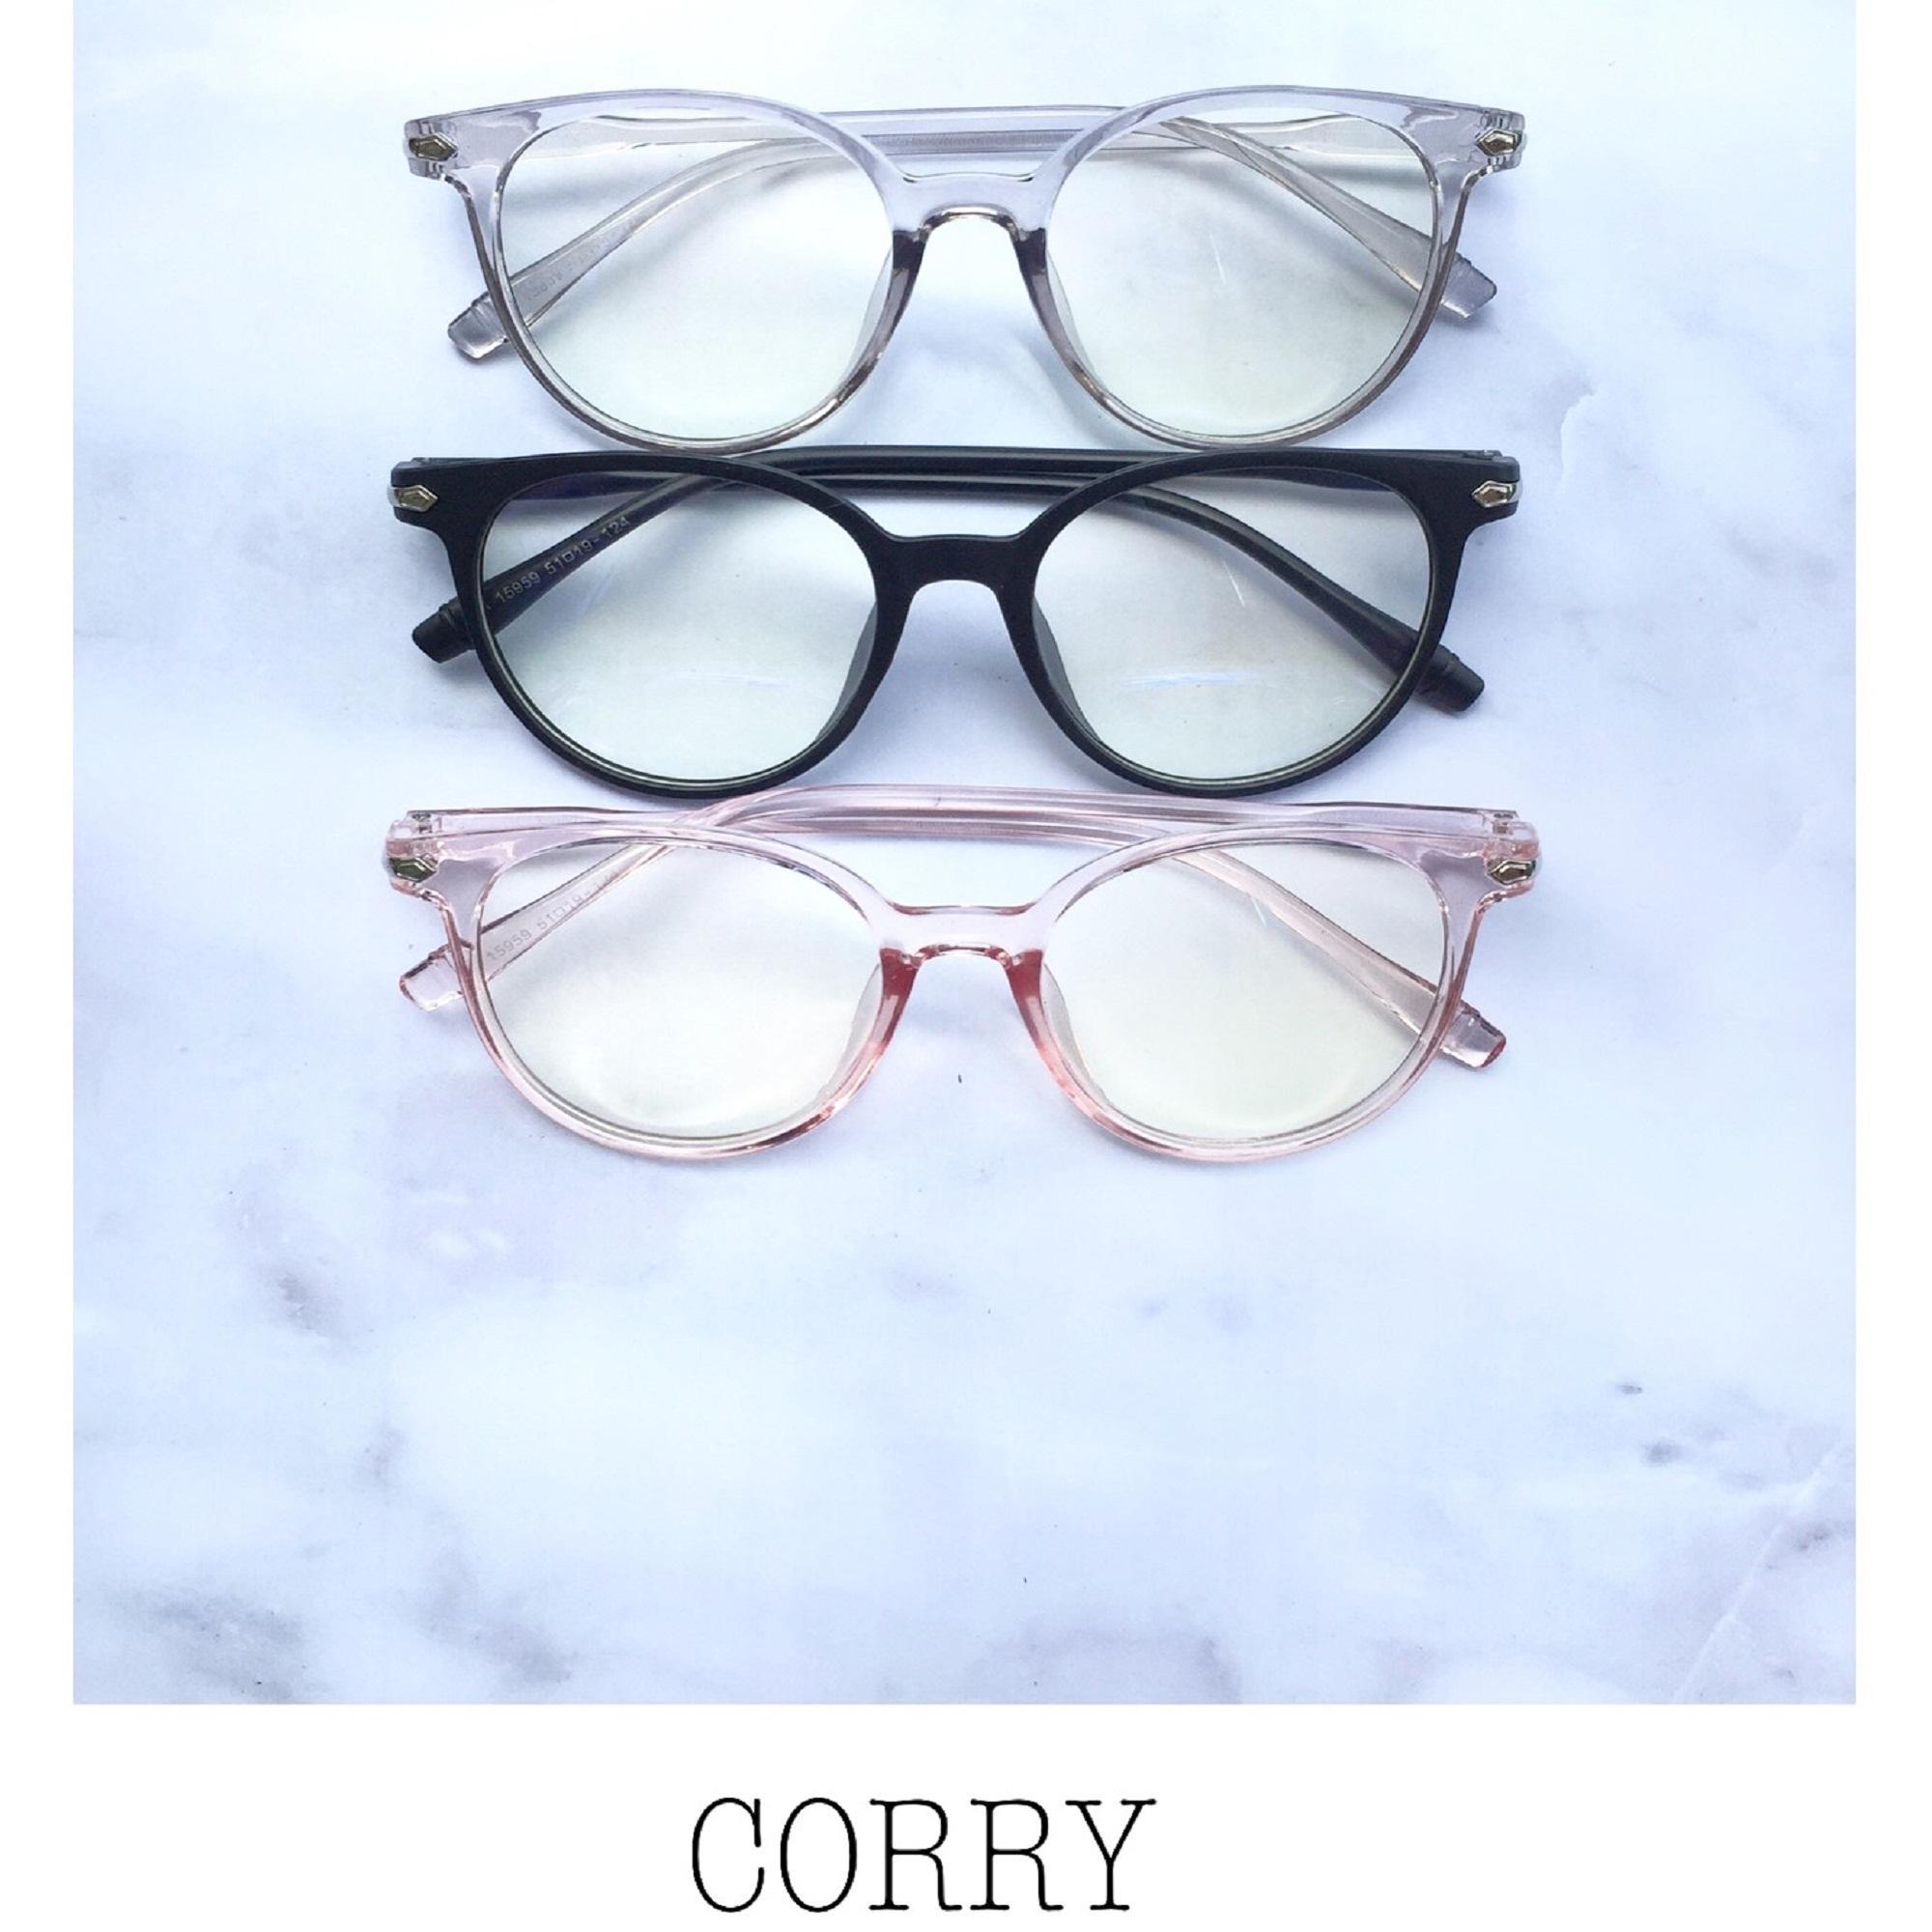 Harga Kacamata Minus Termurah Terbaru 2018 Daftar Frame Kotak Terlaris Corry Orend Tamata Sunglasses Hitam Korea Lensa Aksesoris Fashion Wanita Pria Unisex